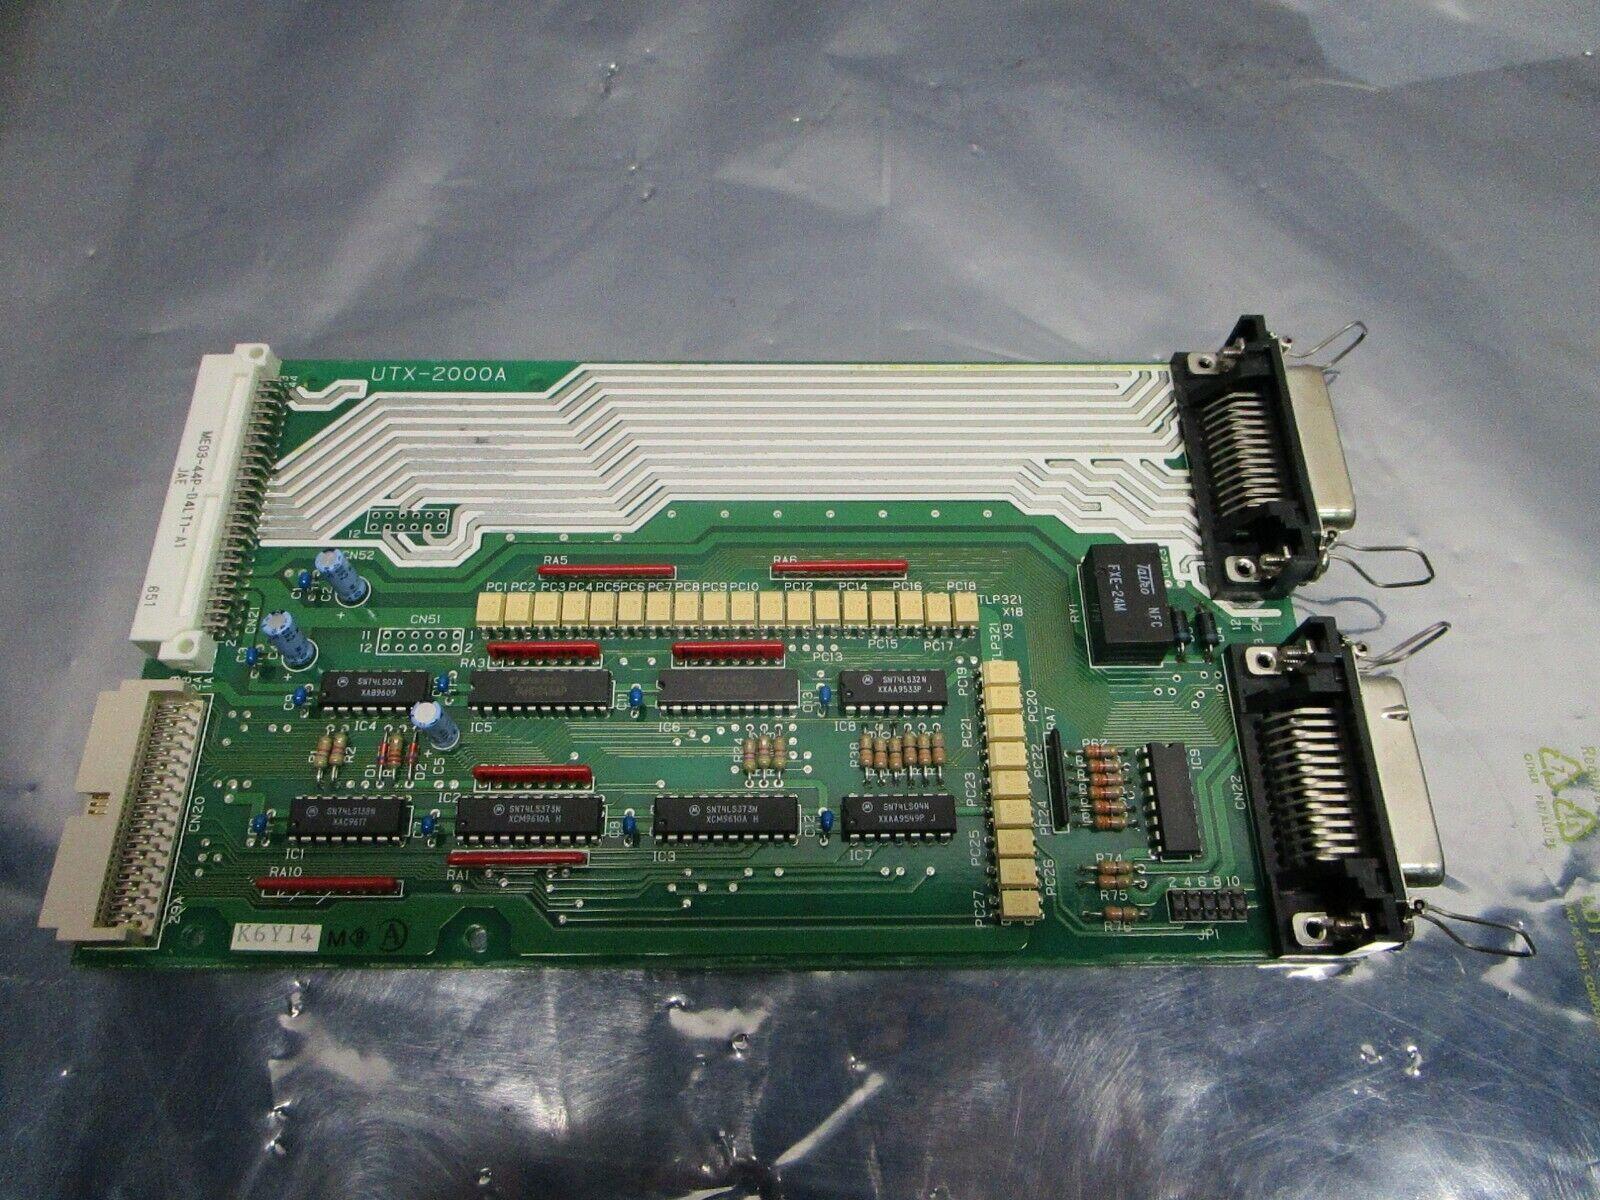 MECS UTX-2000A Robot Controller Board, PCB, ME03-44P-D4LT1-A1, 101201